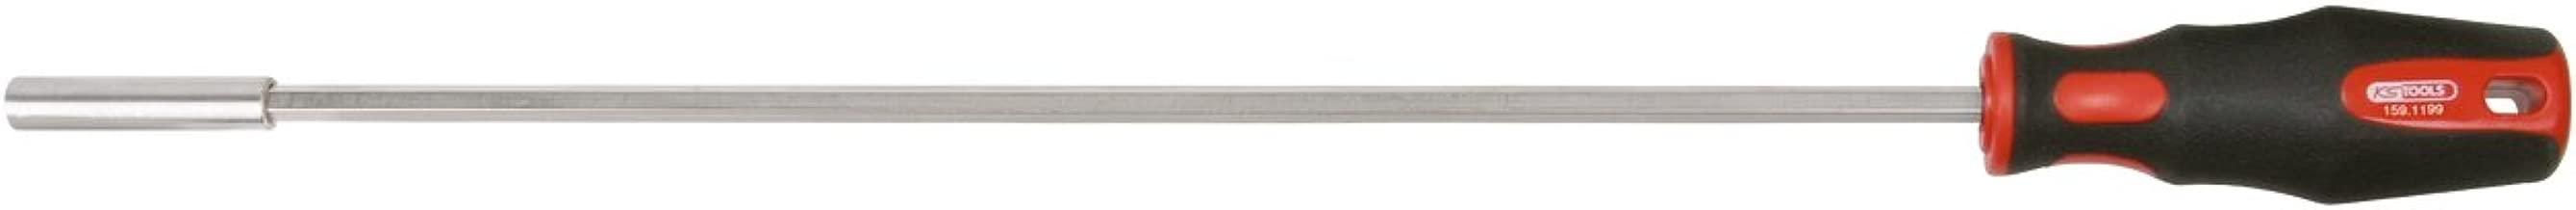 Juego de remaches ciegos KS Tools 970.0150